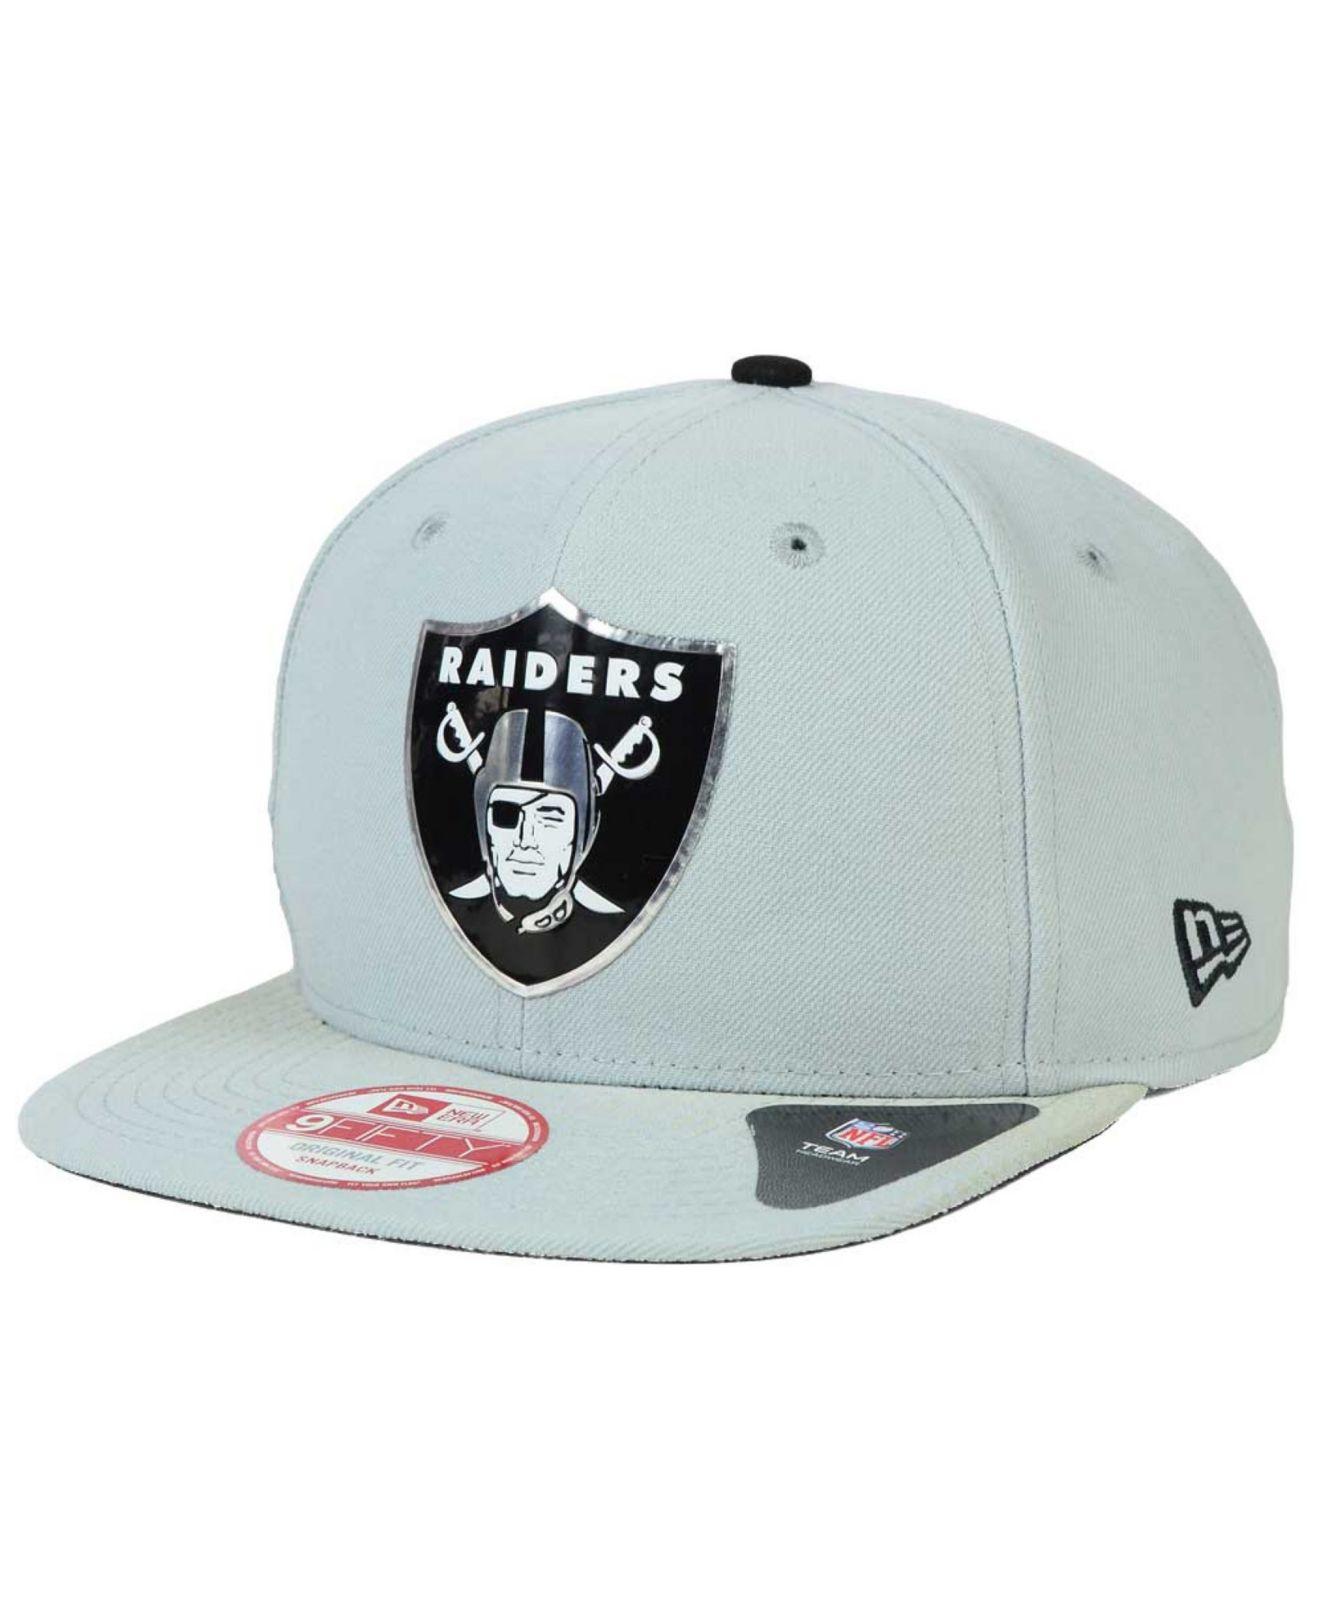 Lyst - Ktz Oakland Raiders Draft Redux 9fifty Snapback Cap in Gray ... 02df231f6ec5